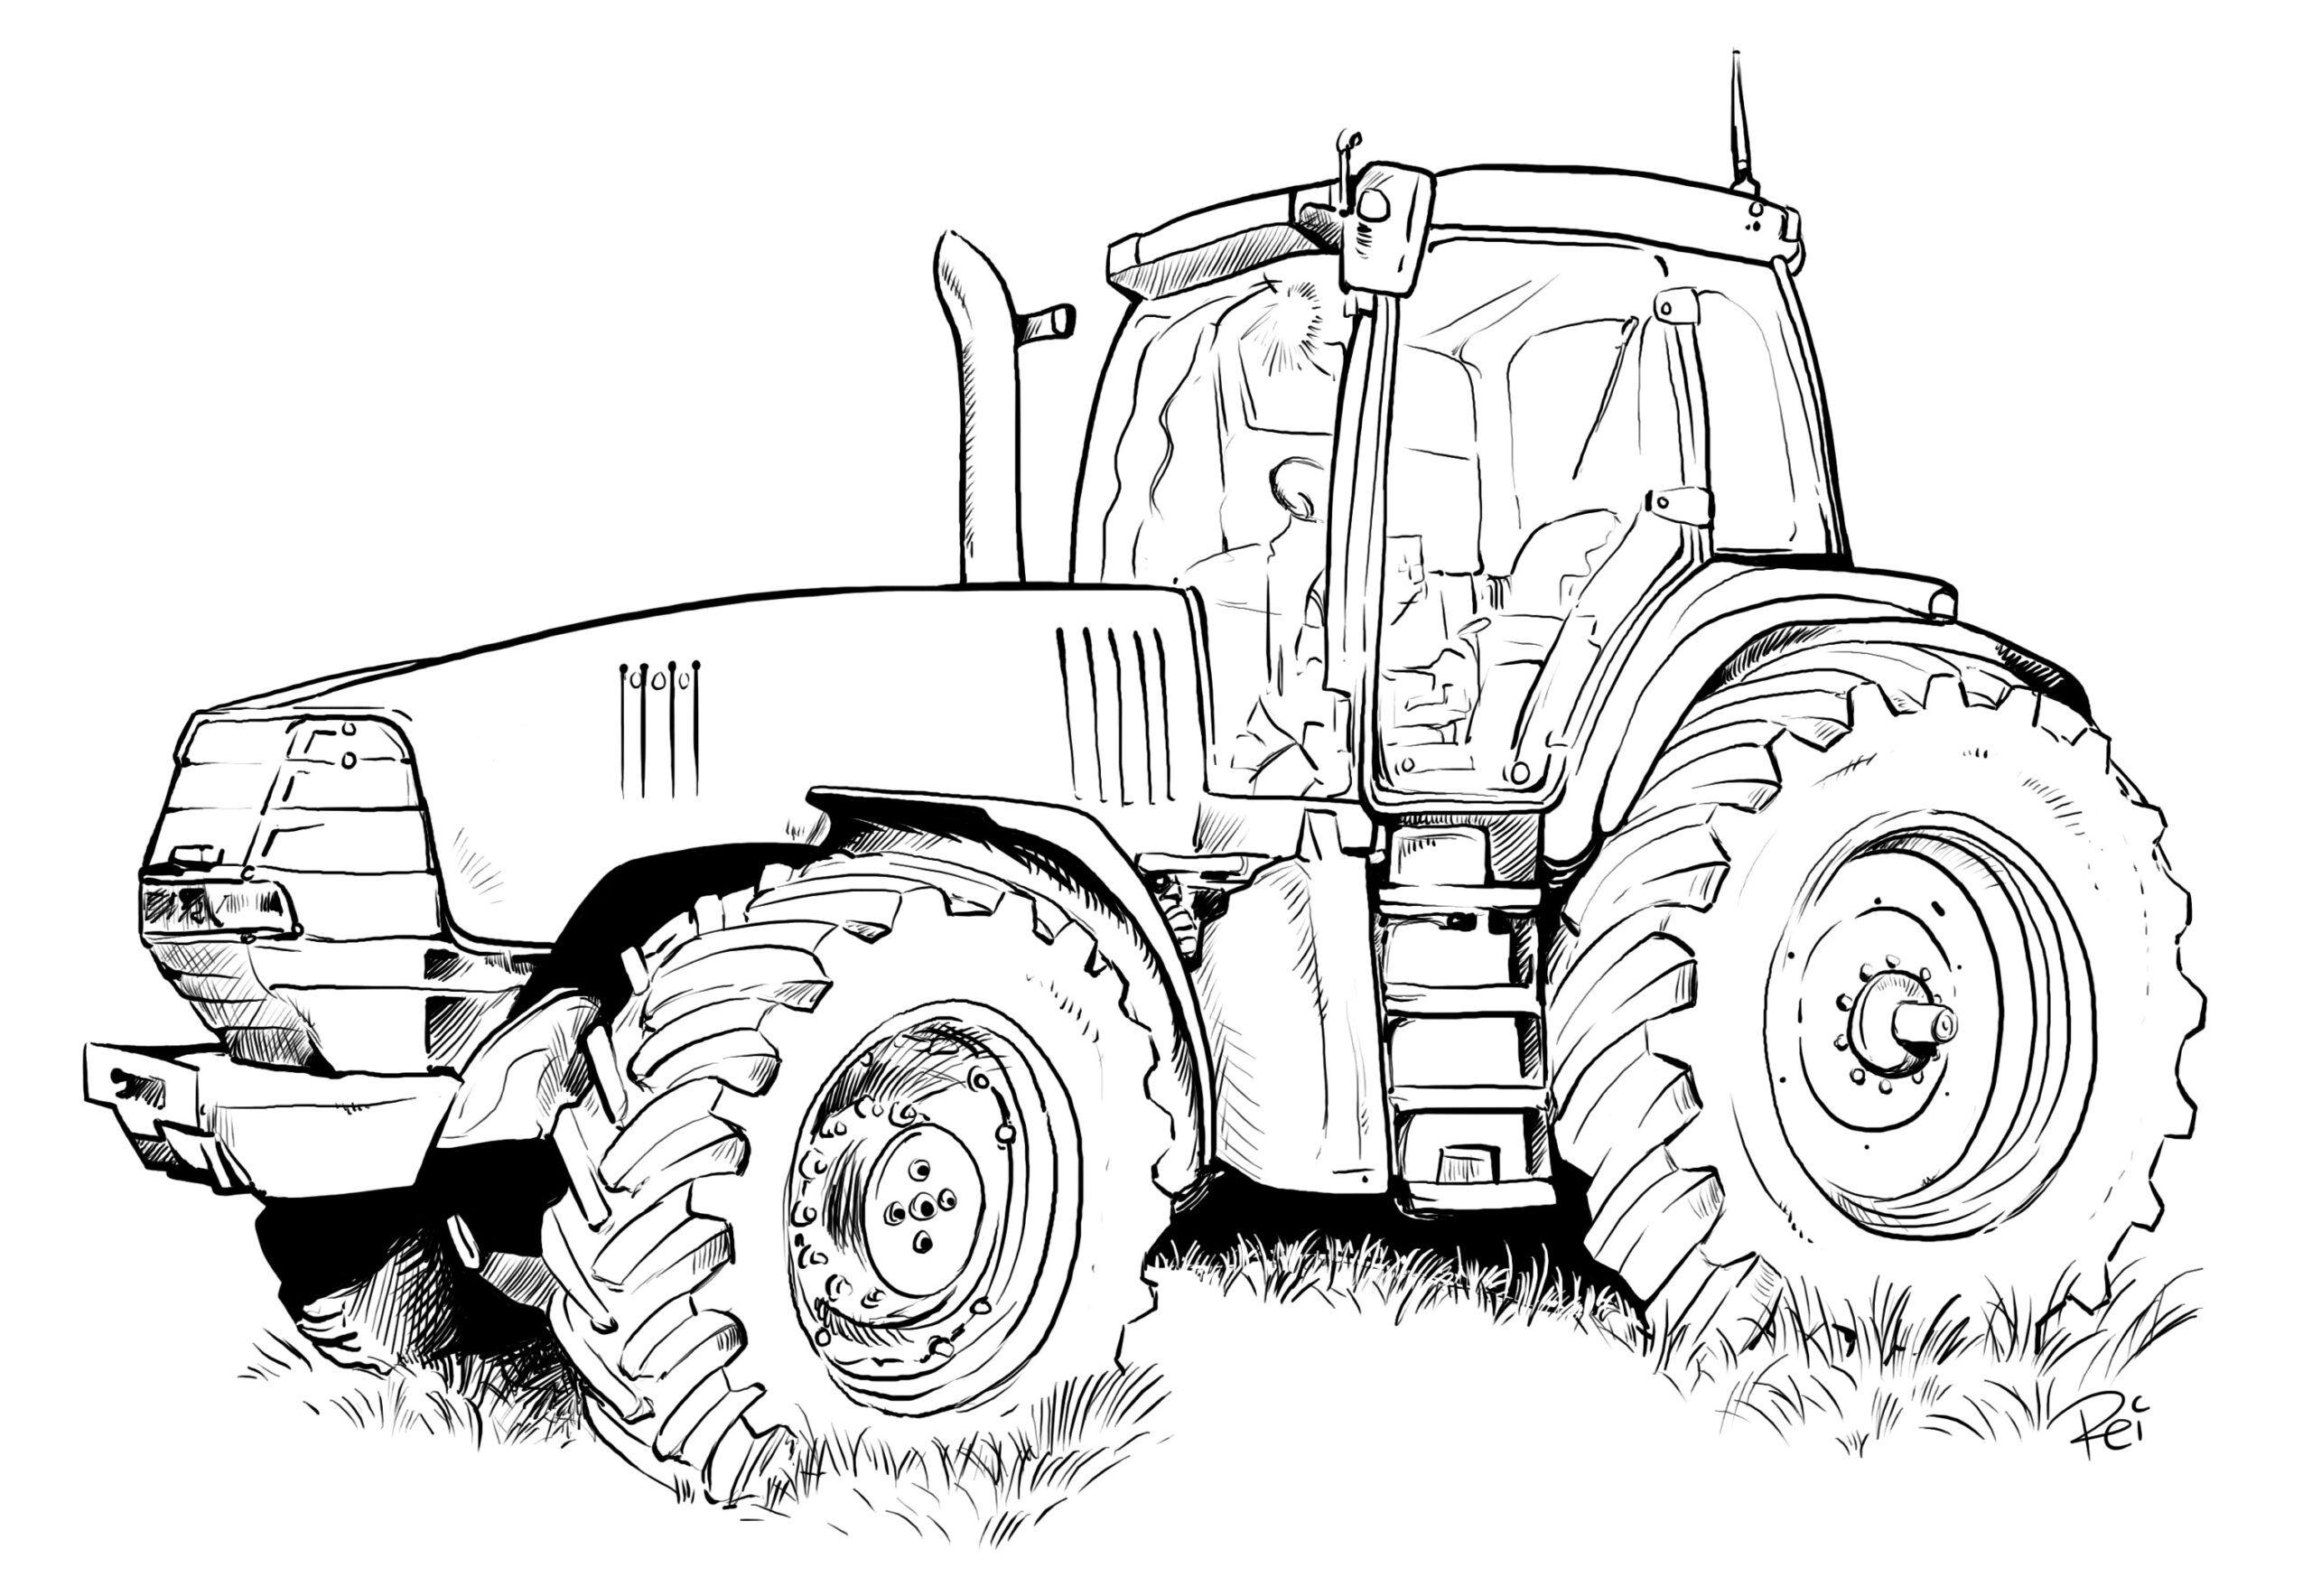 10 Gut Traktor Malvorlage Idee 2020 Tractor Coloring Pages Coloring Pages Inspirational Deer Coloring Pages